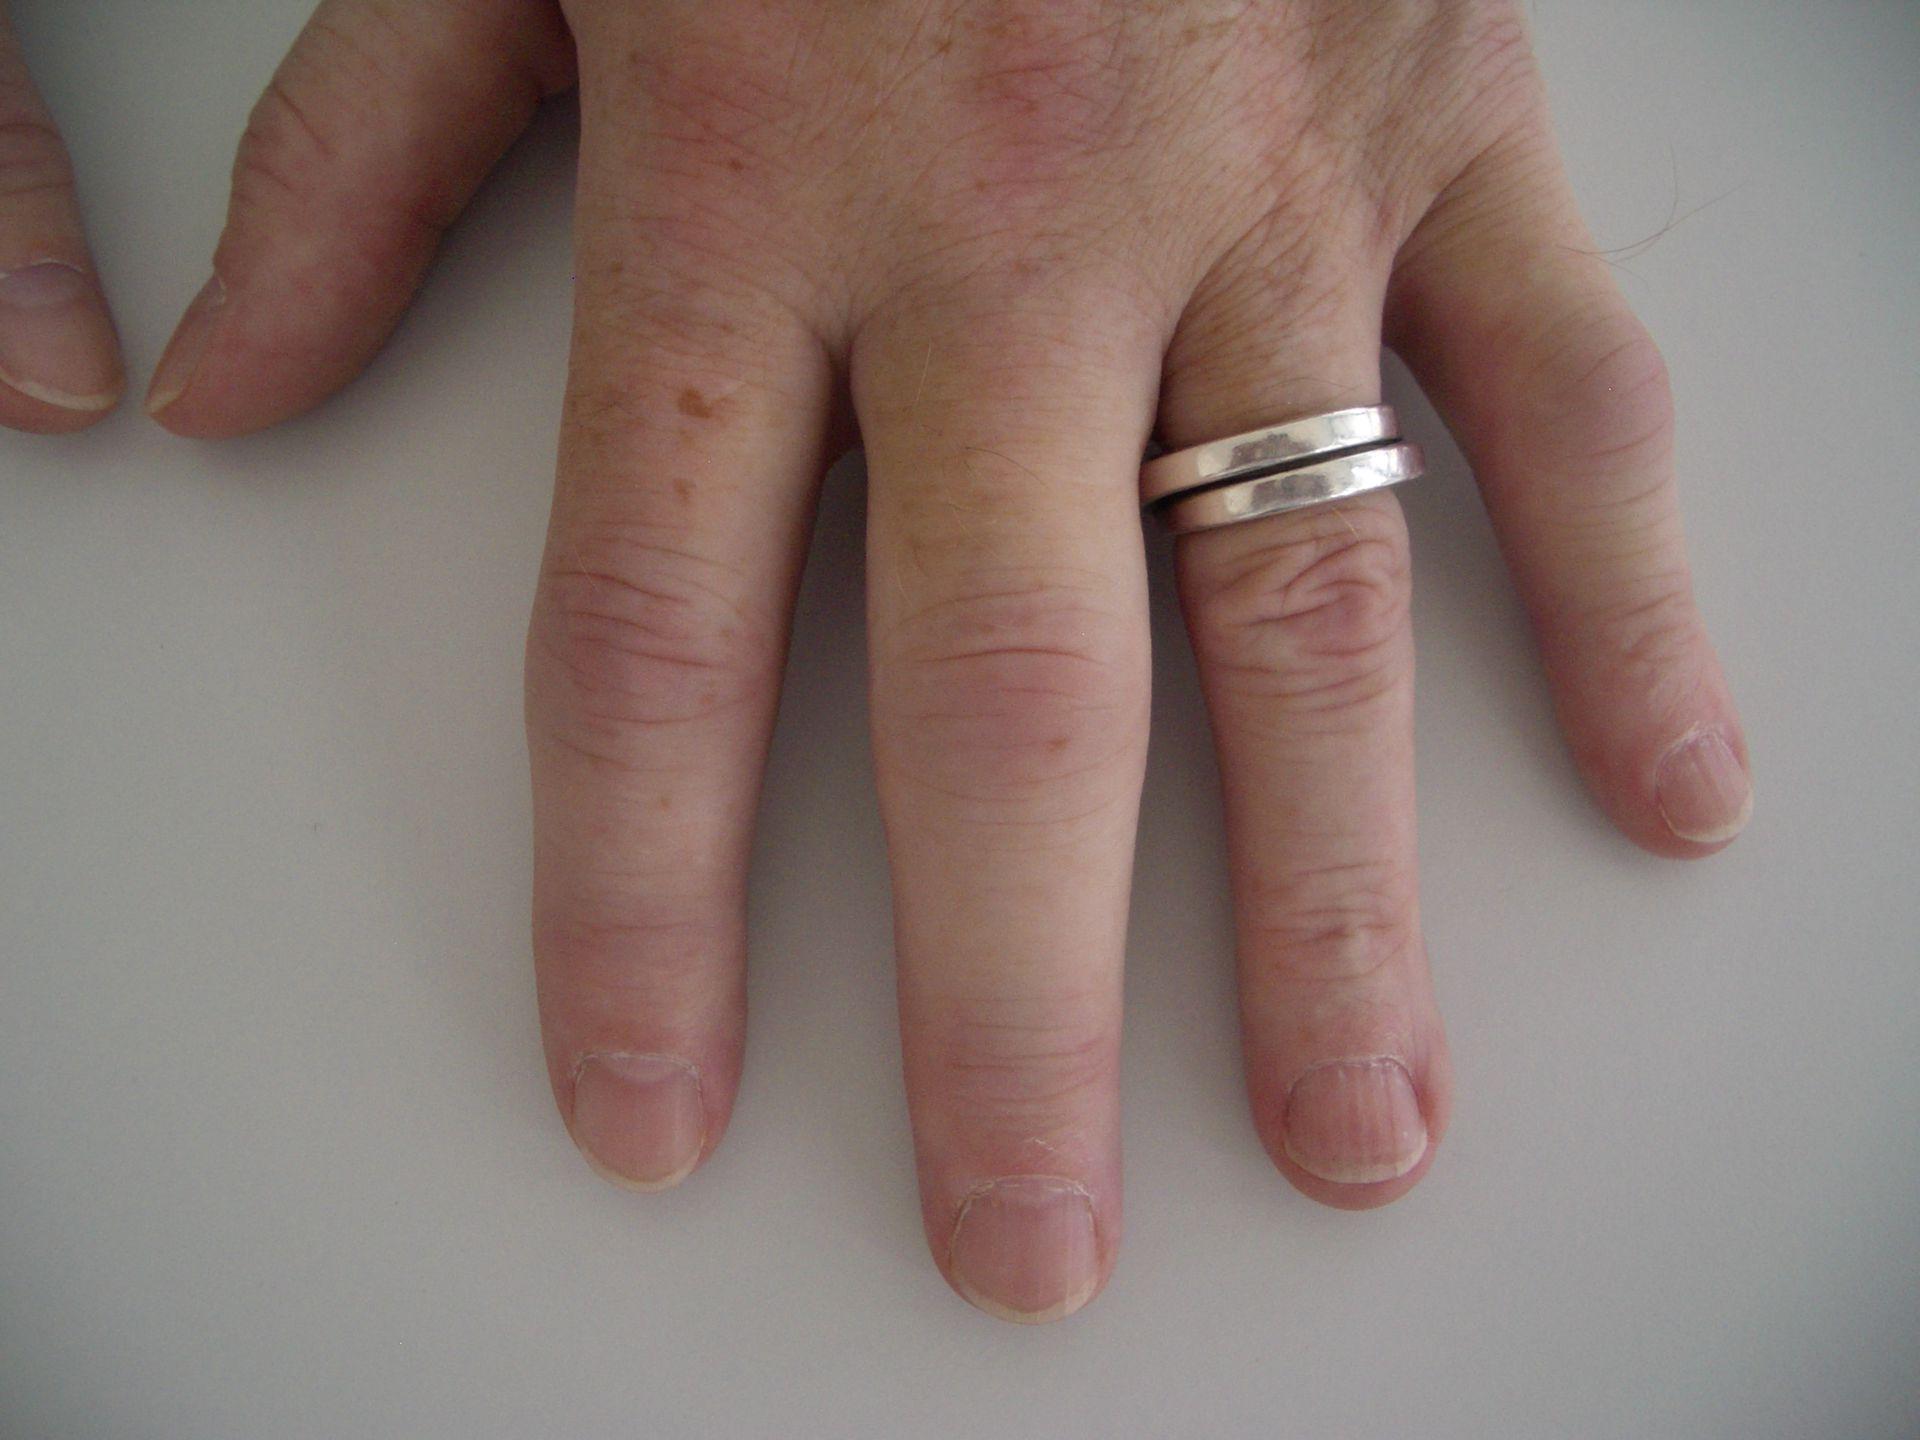 Artrite reumatoide iniziale